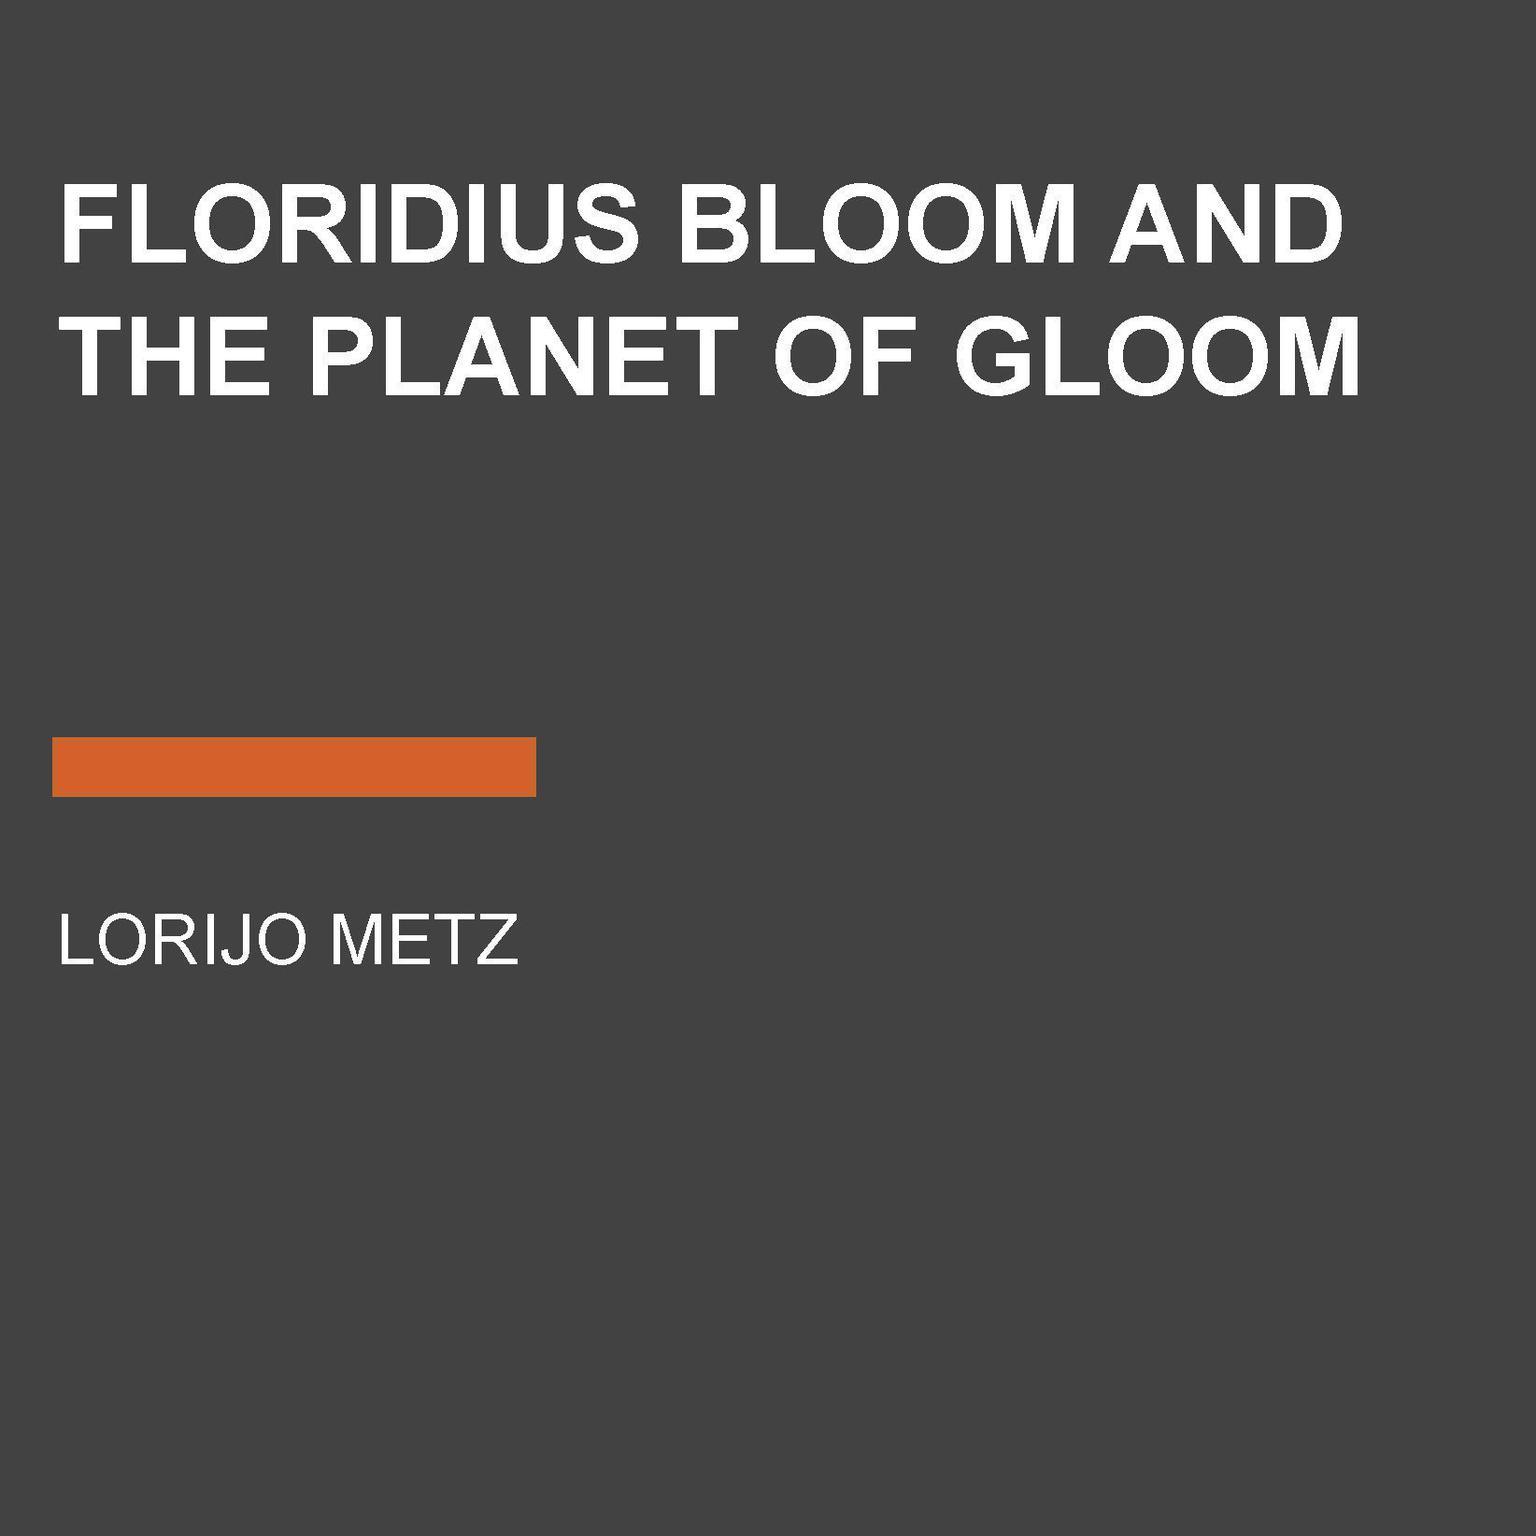 Floridius Bloom and The Planet of Gloom Audiobook, by Lorijo Metz